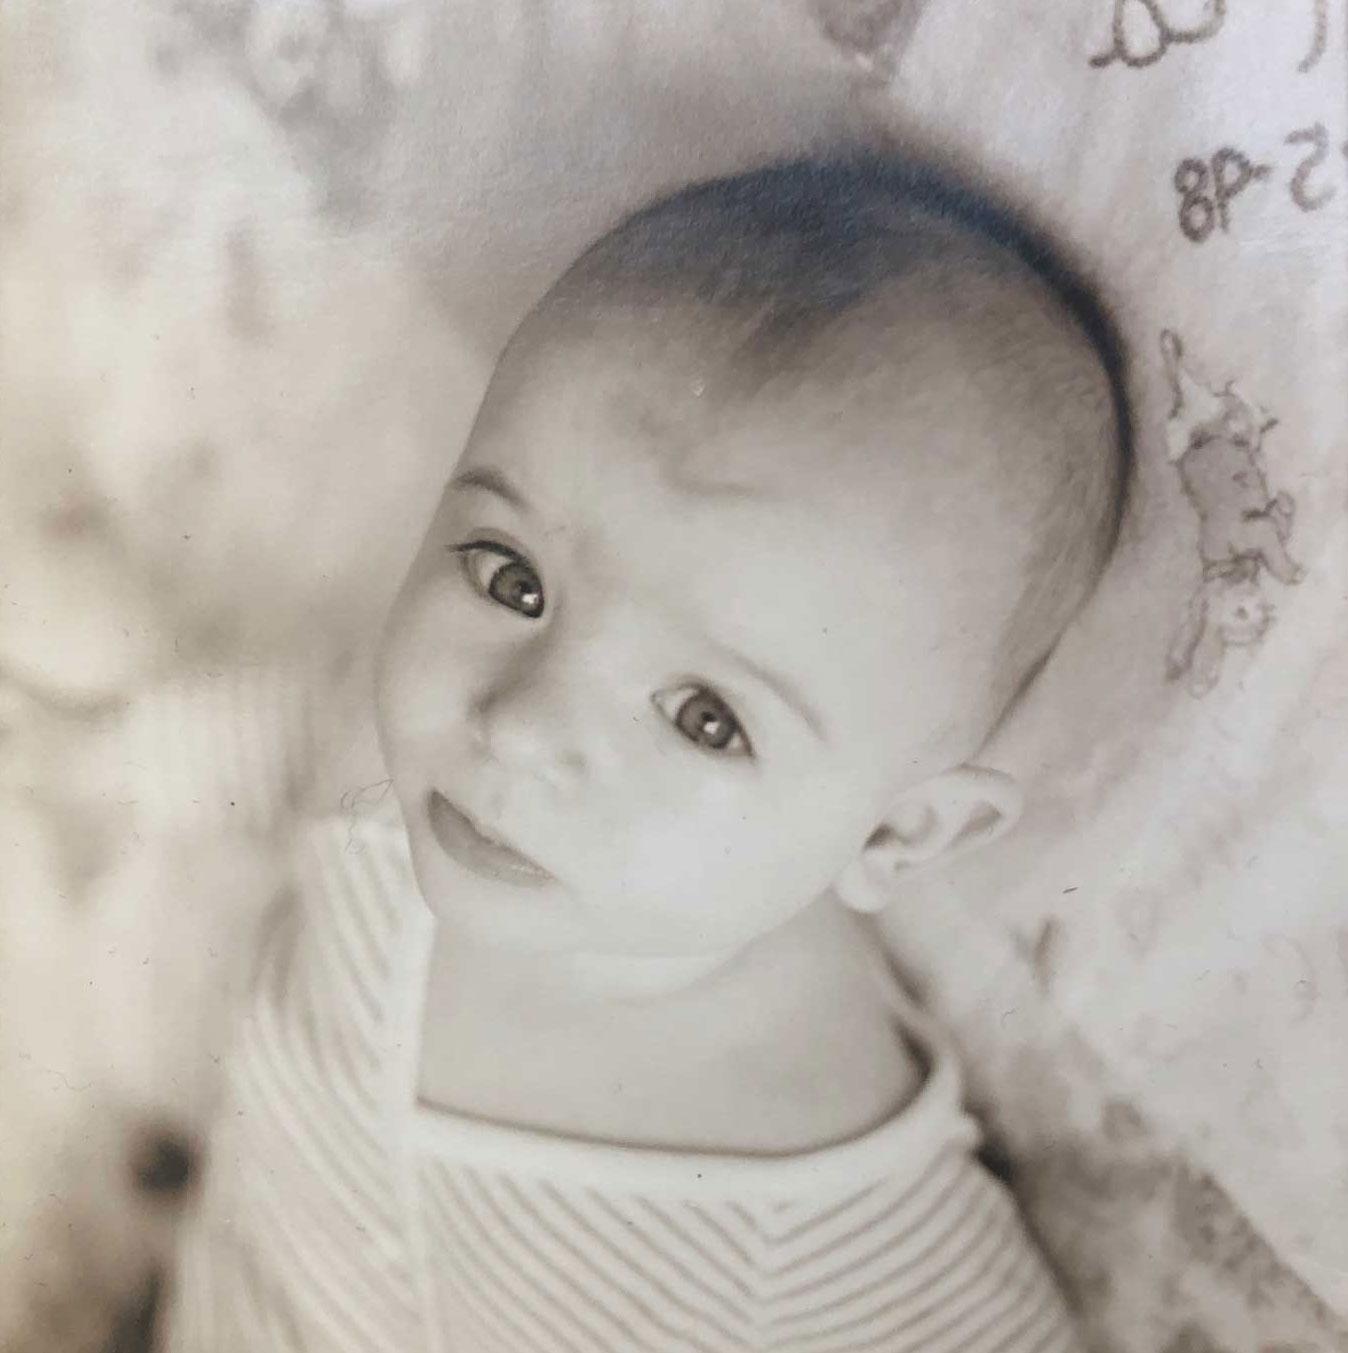 Mia, 4 months